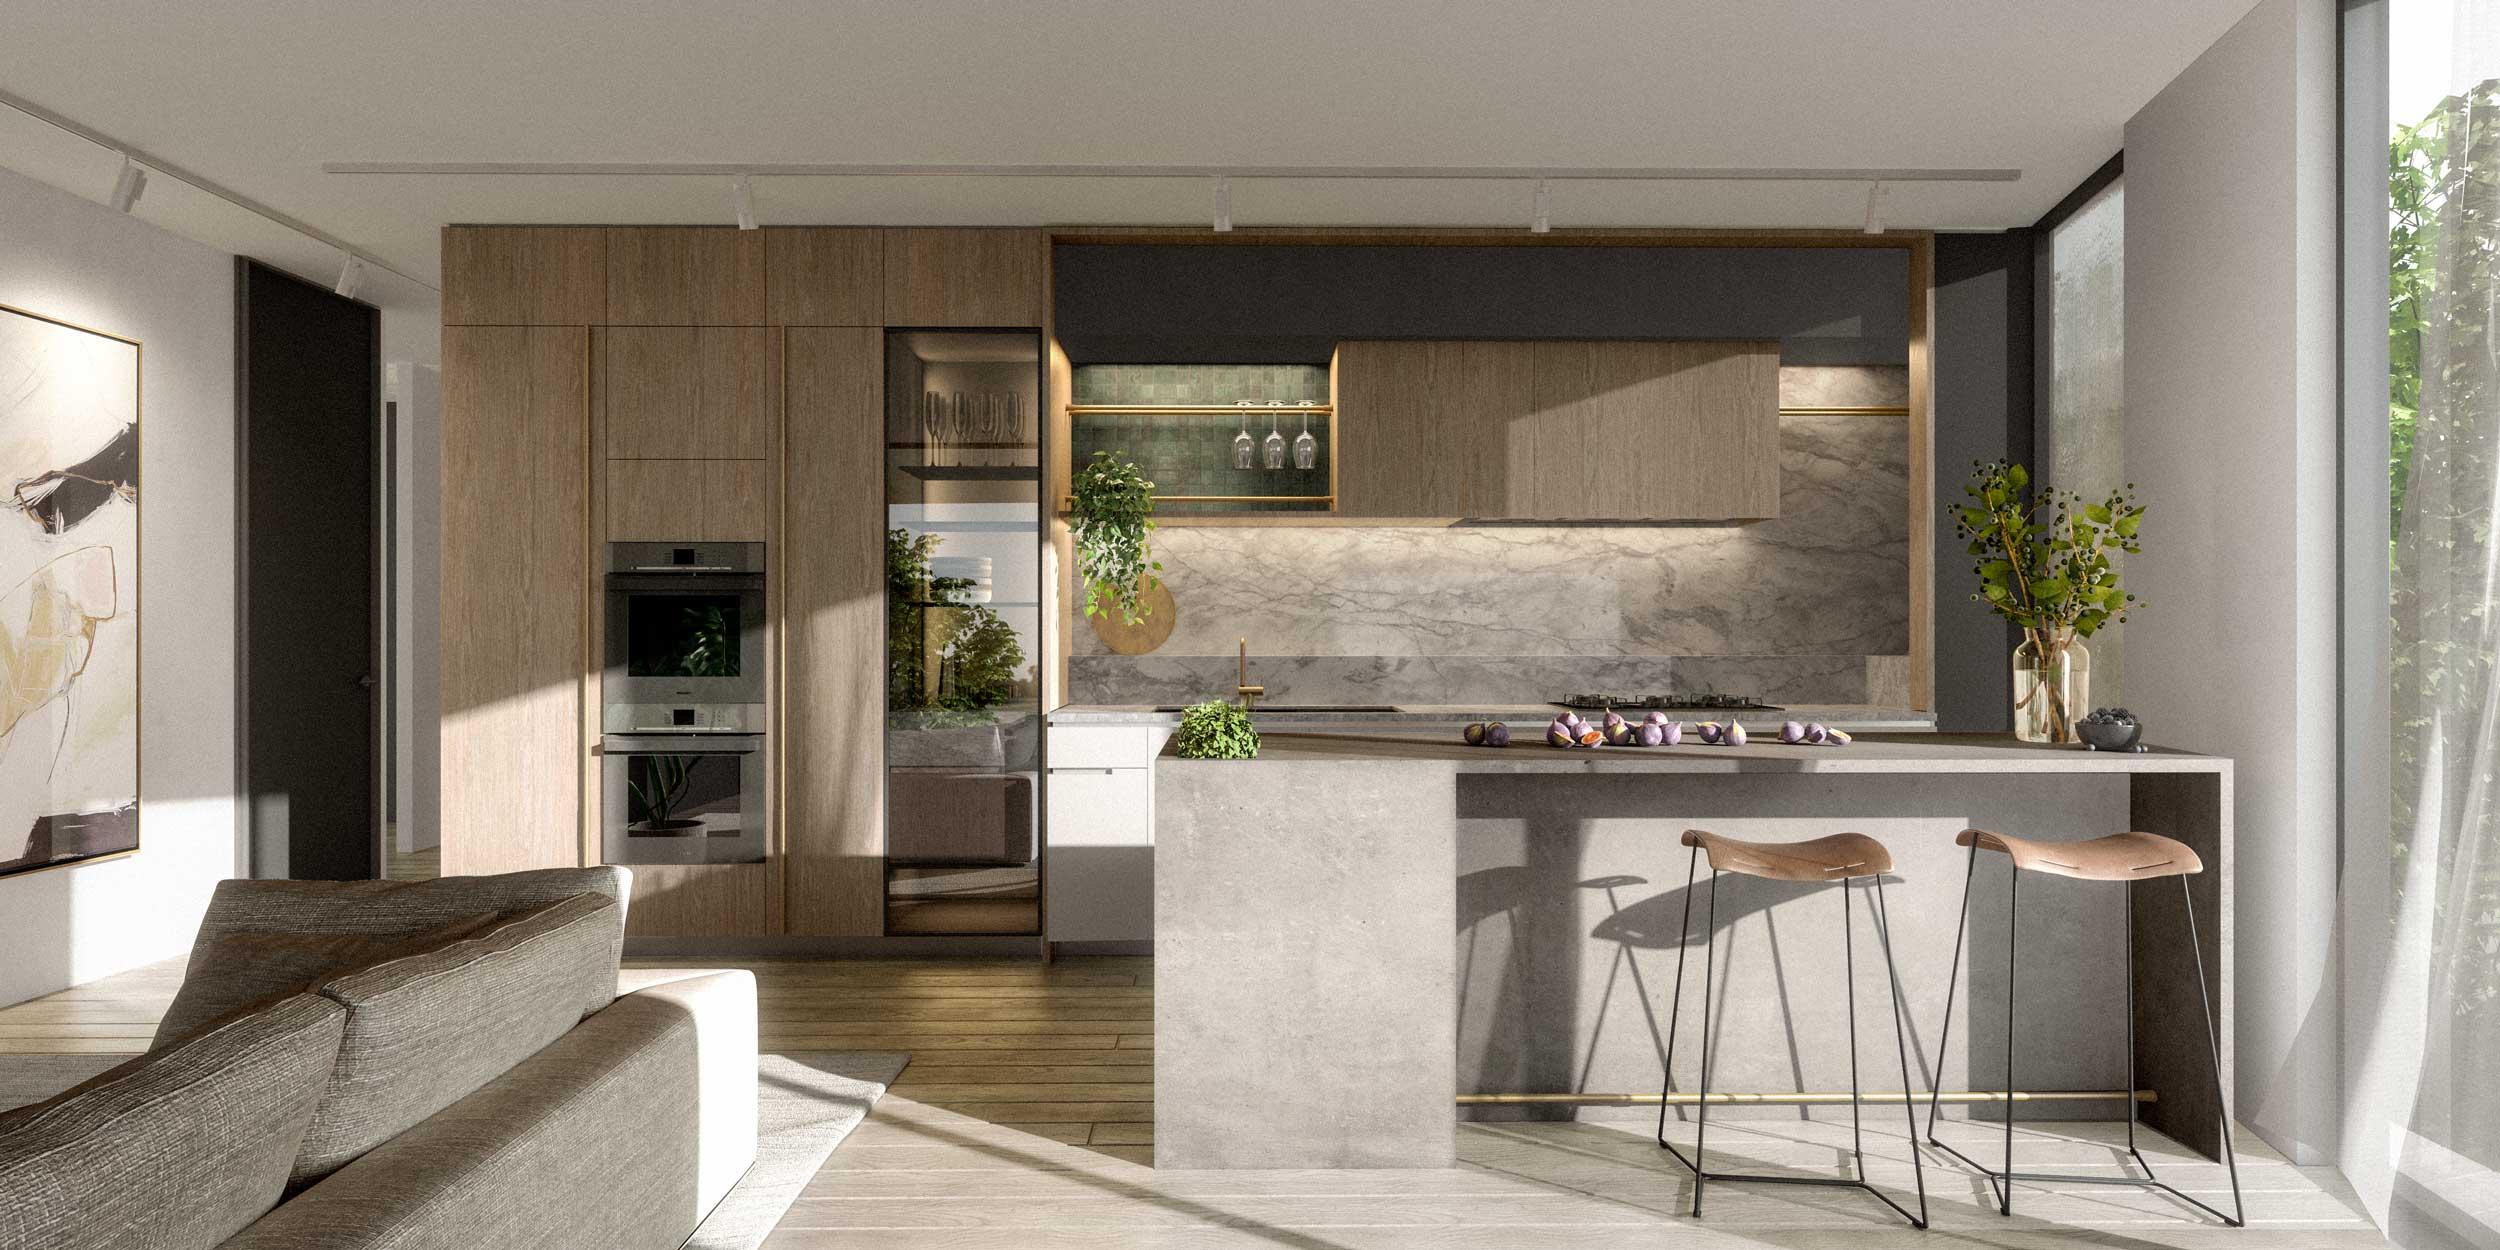 Kitchen-Light-redo.jpg